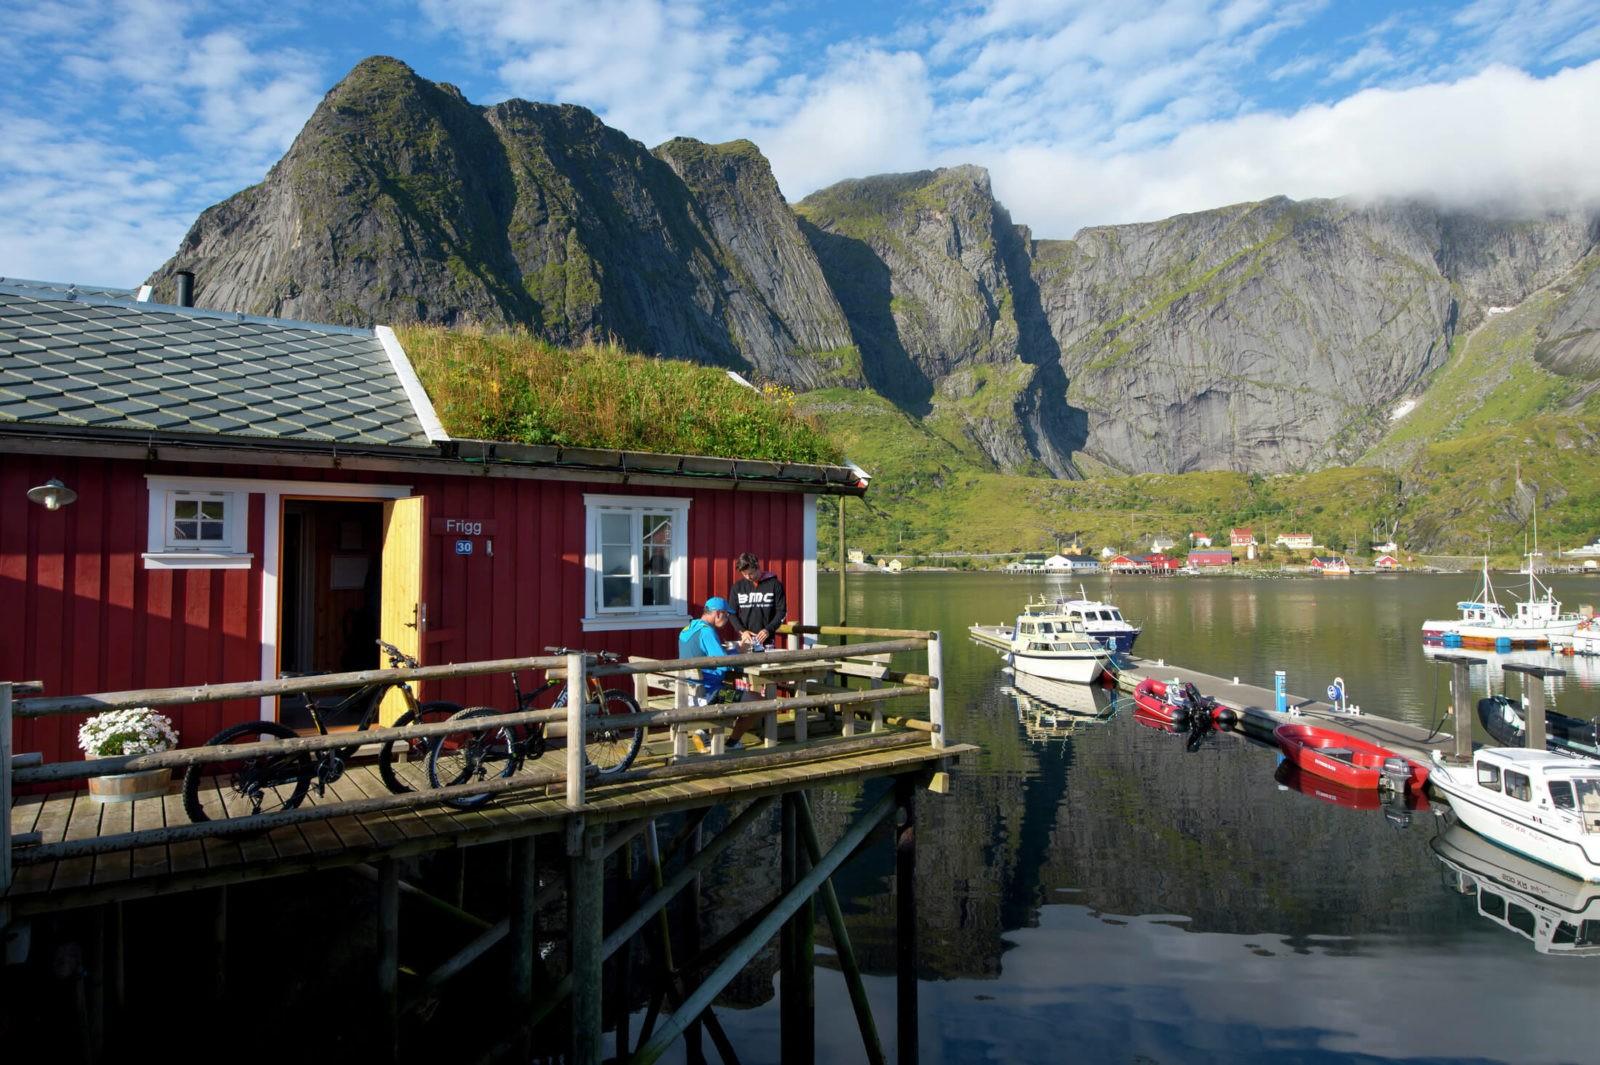 Kleine vissersdorpjes in Noord Noorwegen (Foto: ManfredStromberg.com - visitnorway.com)